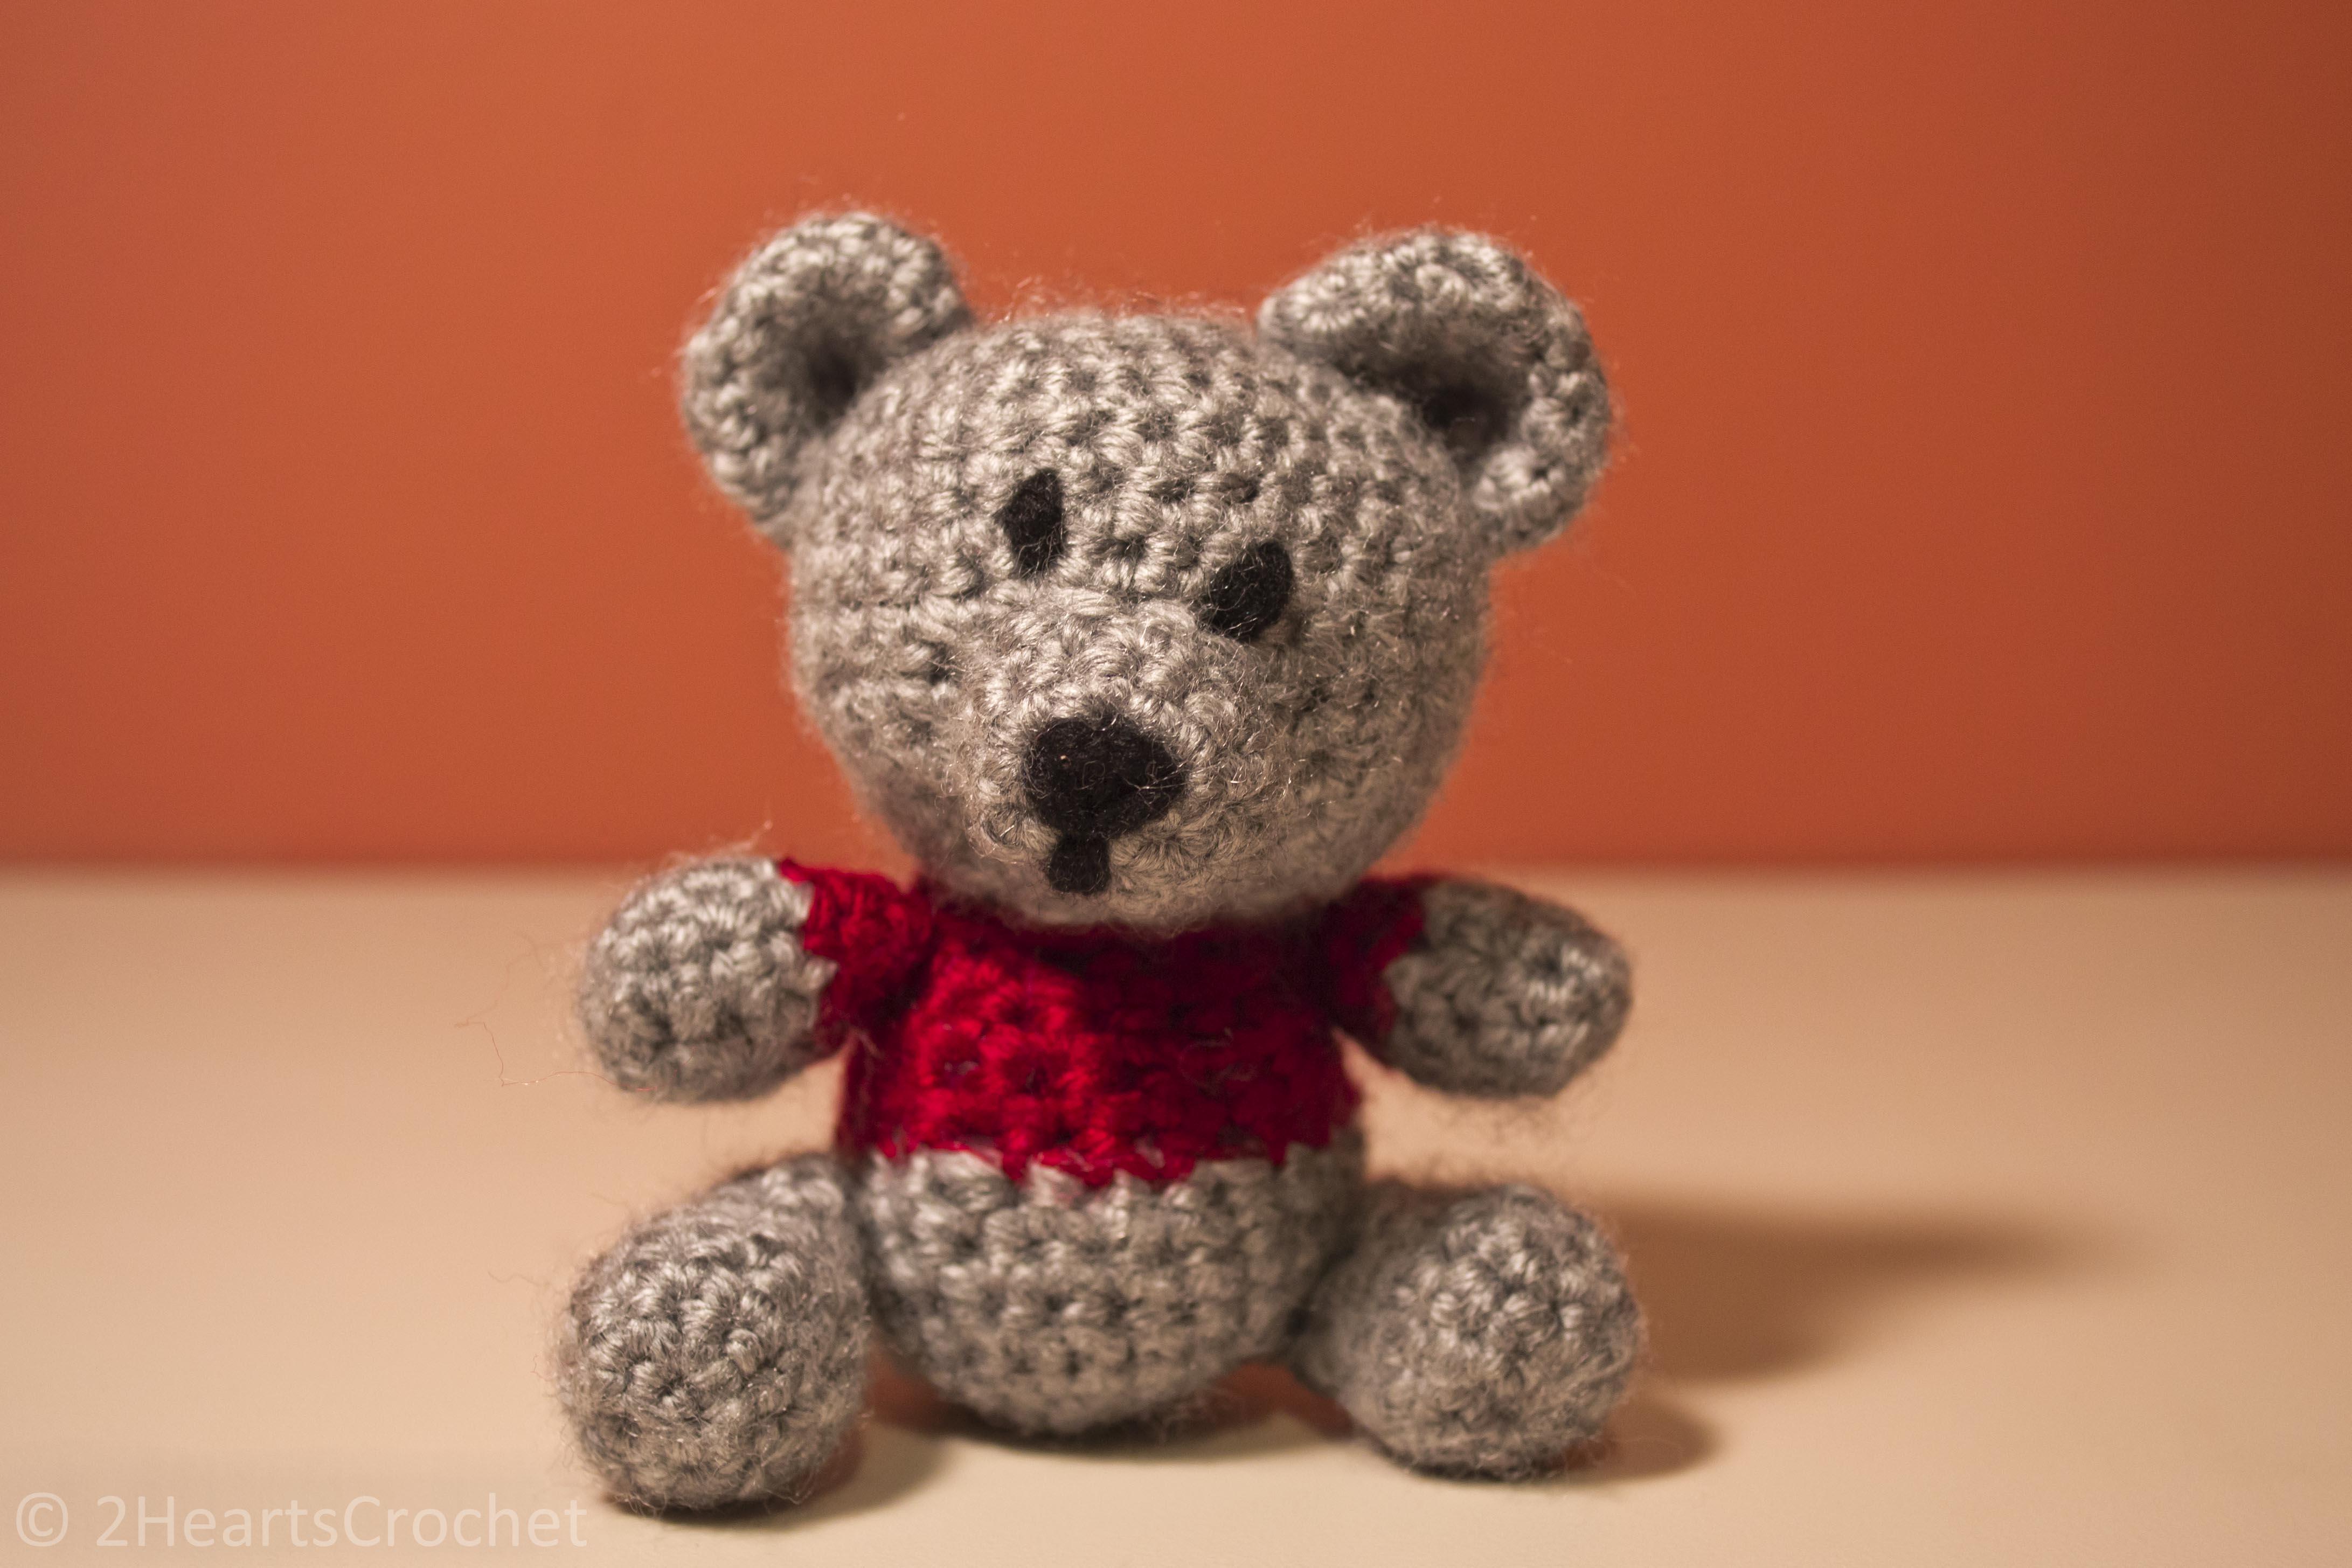 Amigurumi Teddy Bears : Pattern share sam the little teddy bear amigurumi